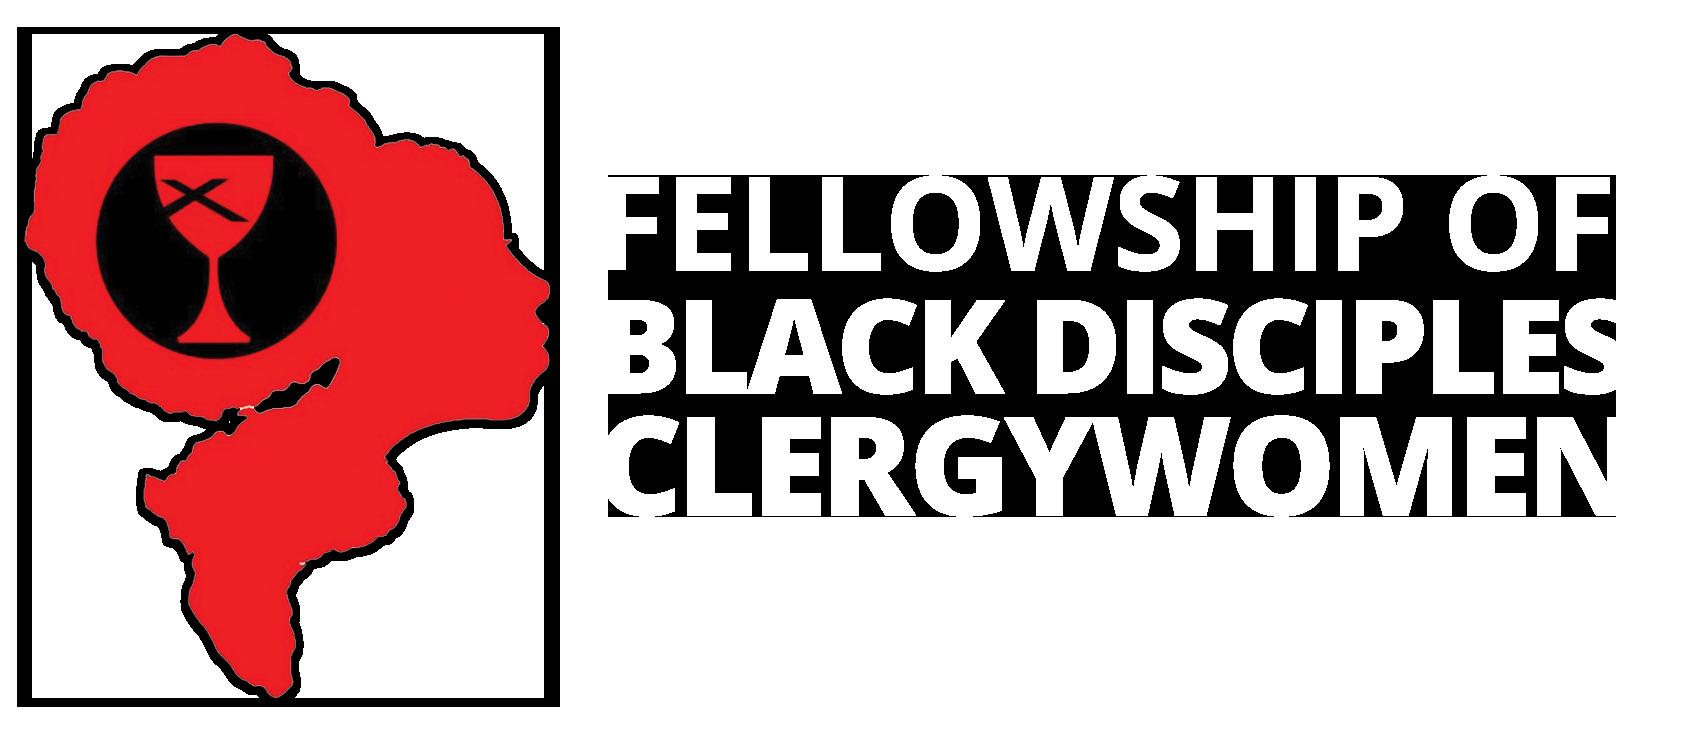 Black Disciples Clergywomen